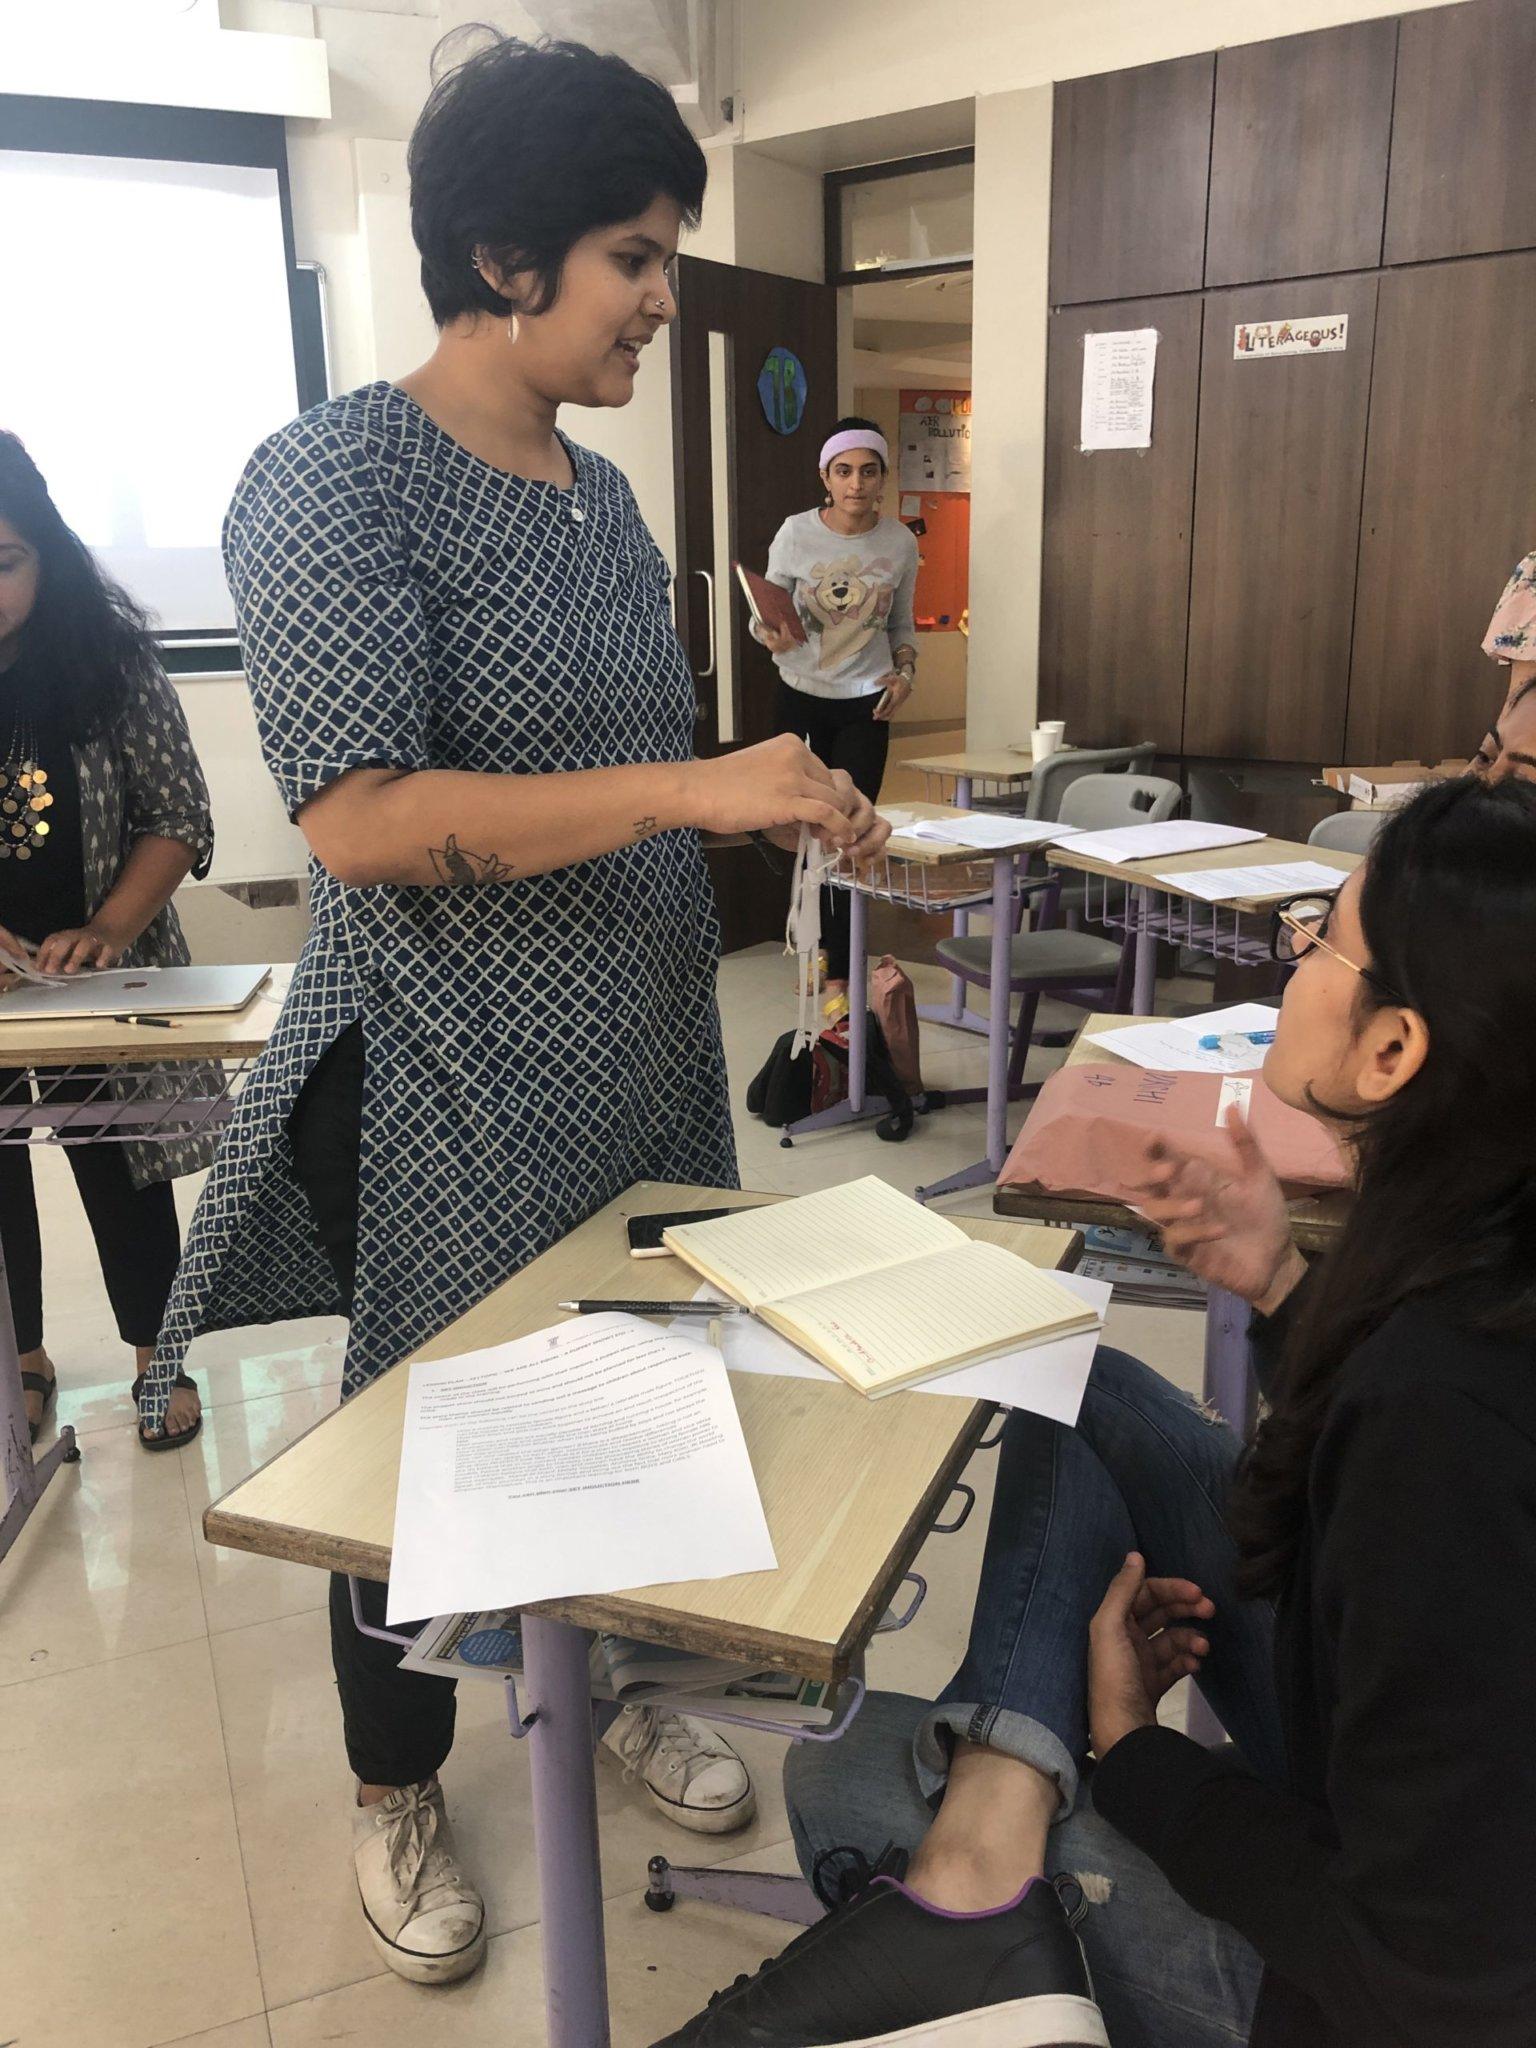 Teacher training – Saturday Art Class - For educators, Saturday Art Class, School